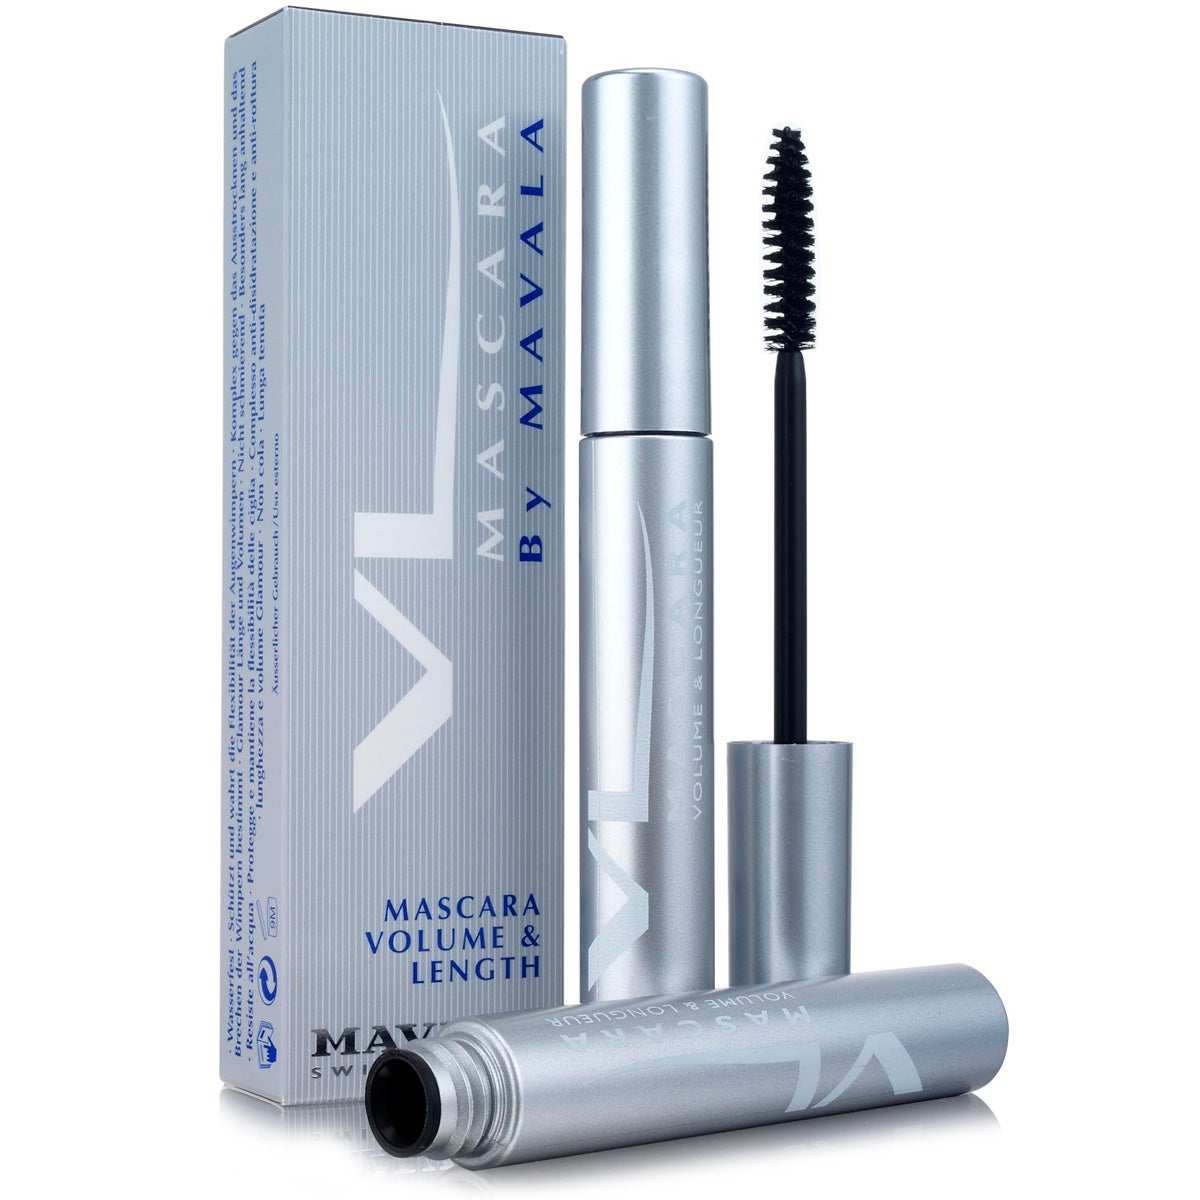 Mascara Volume & Length, 10 ml Mavala Mascara